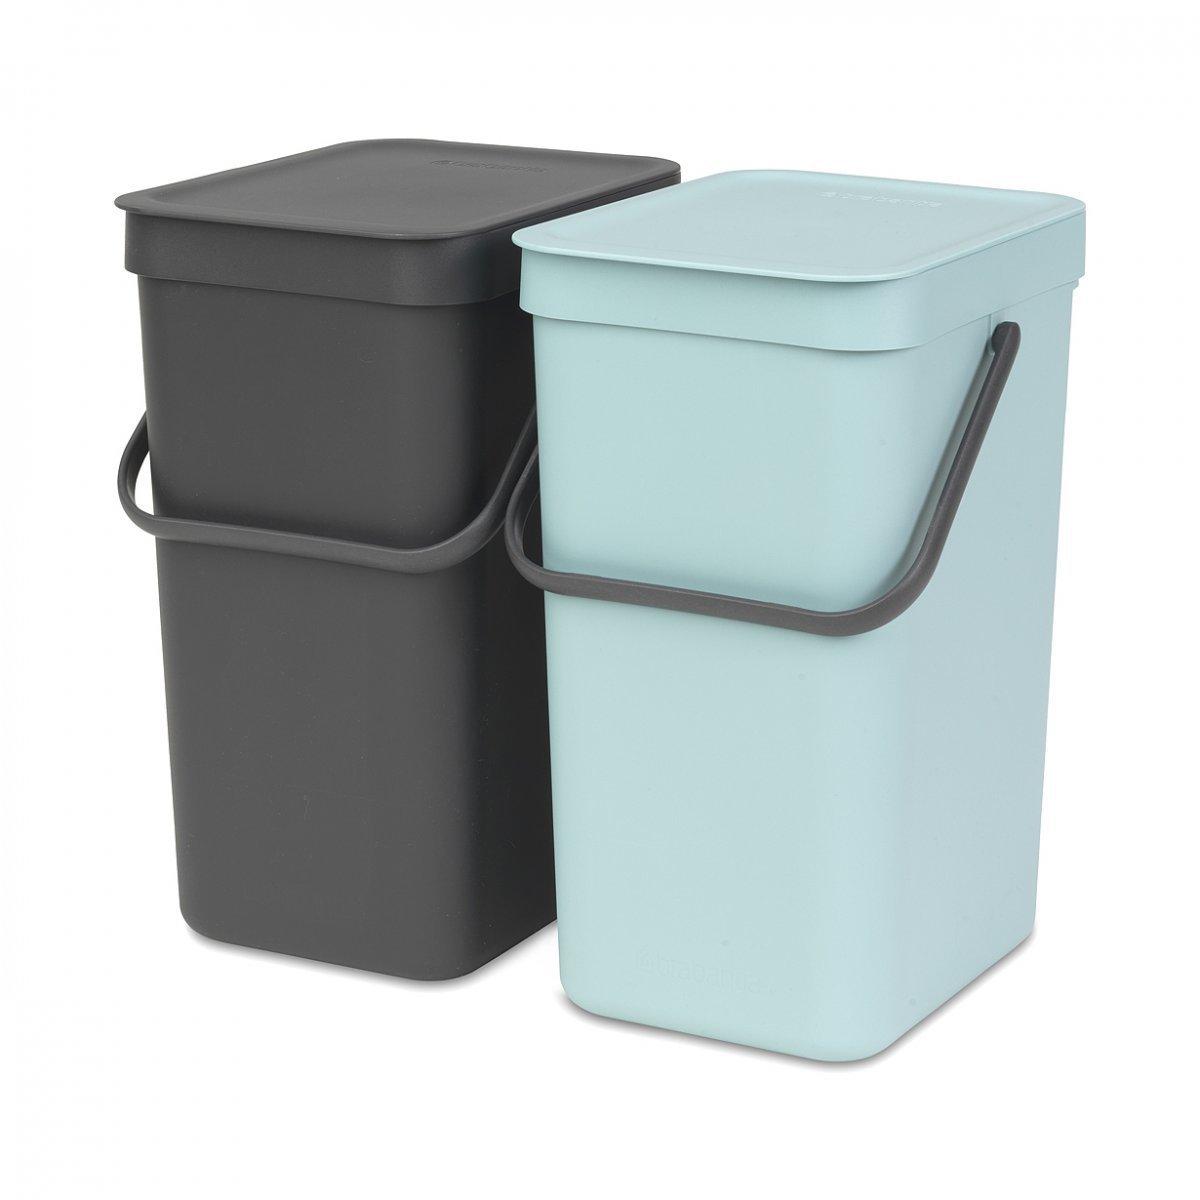 SortGo double 12-litre rubbish bin by Brabantia | LOVEThESIGN